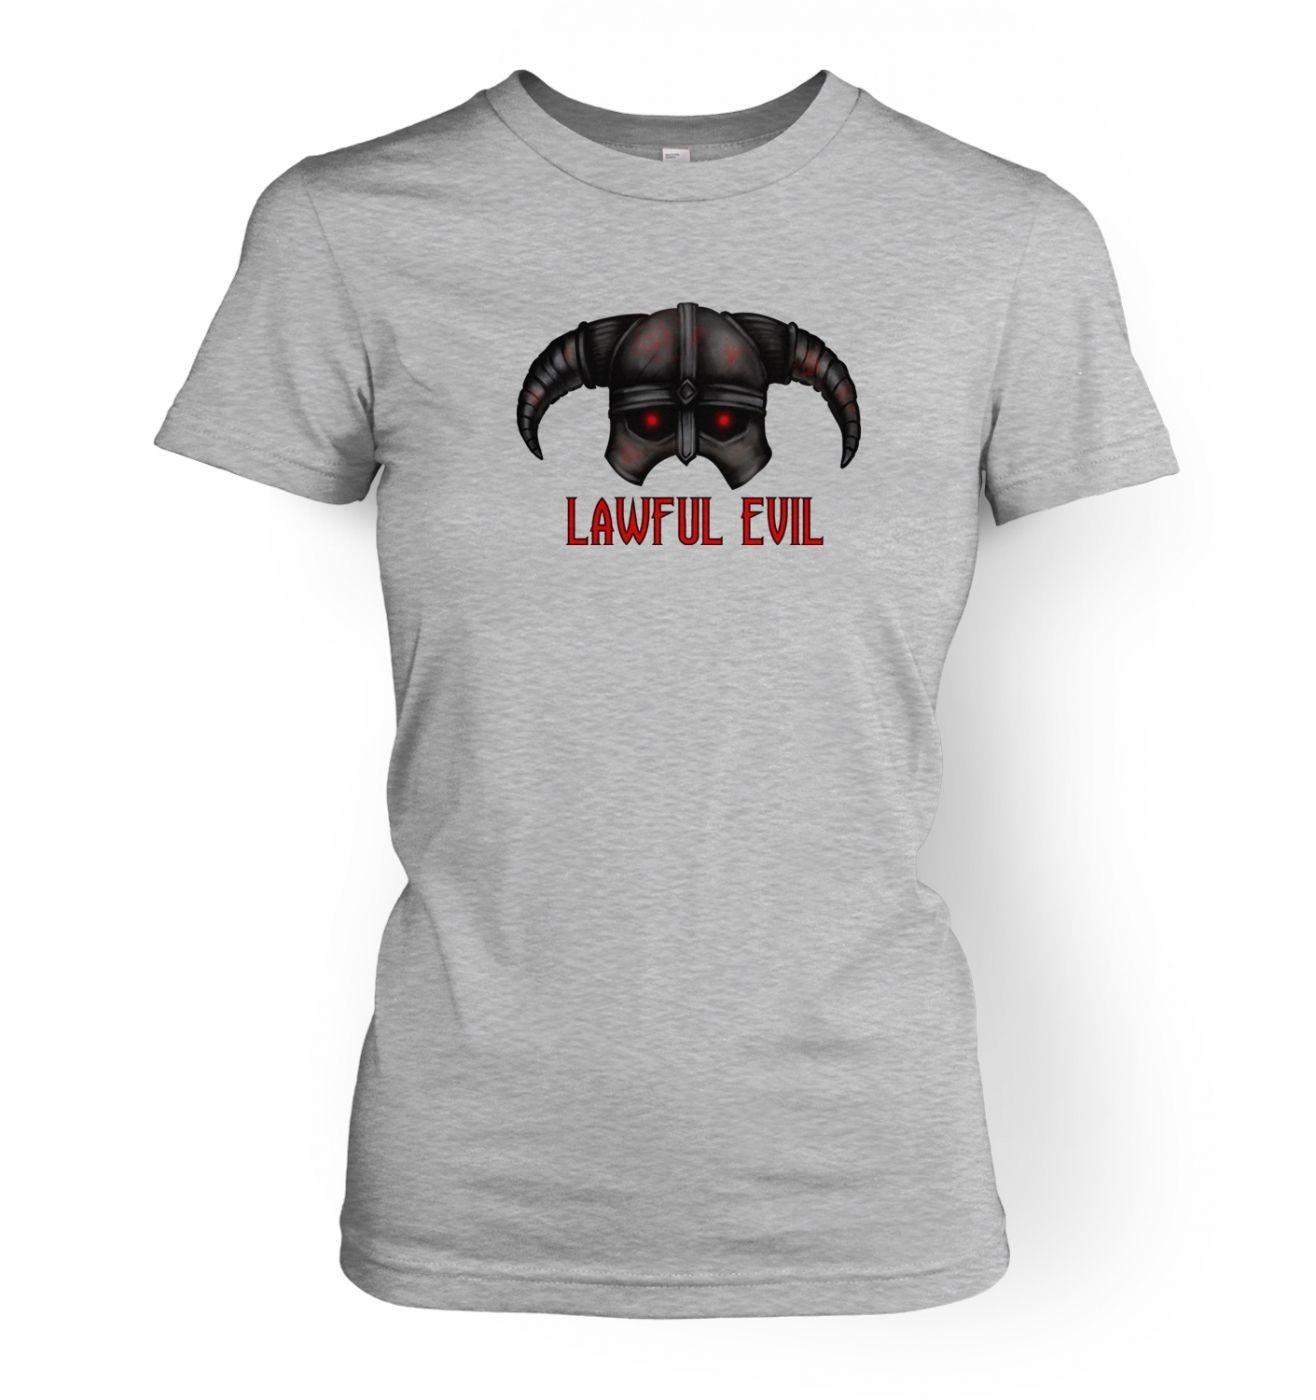 Women's Lawful Evil t-shirt